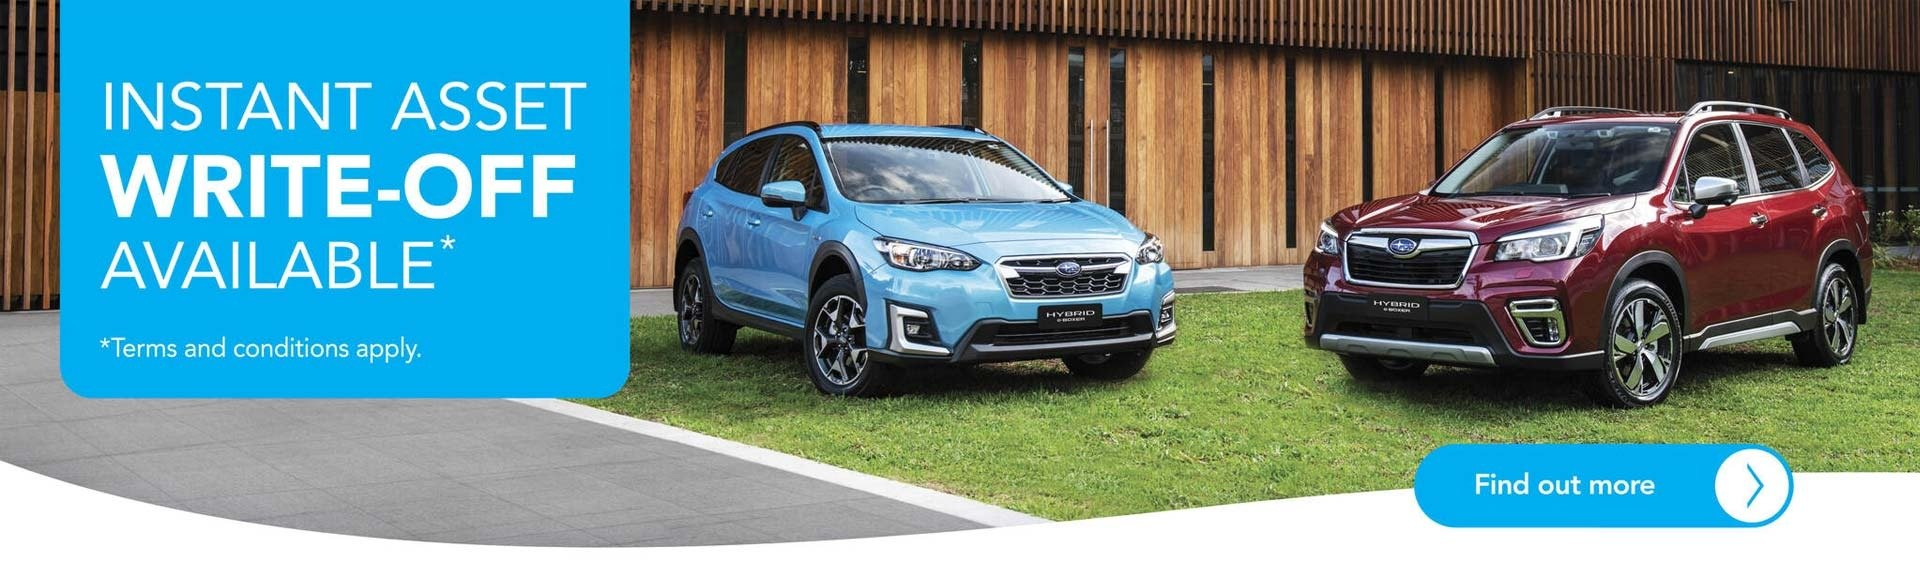 Subaru Instand Asset Write-Off